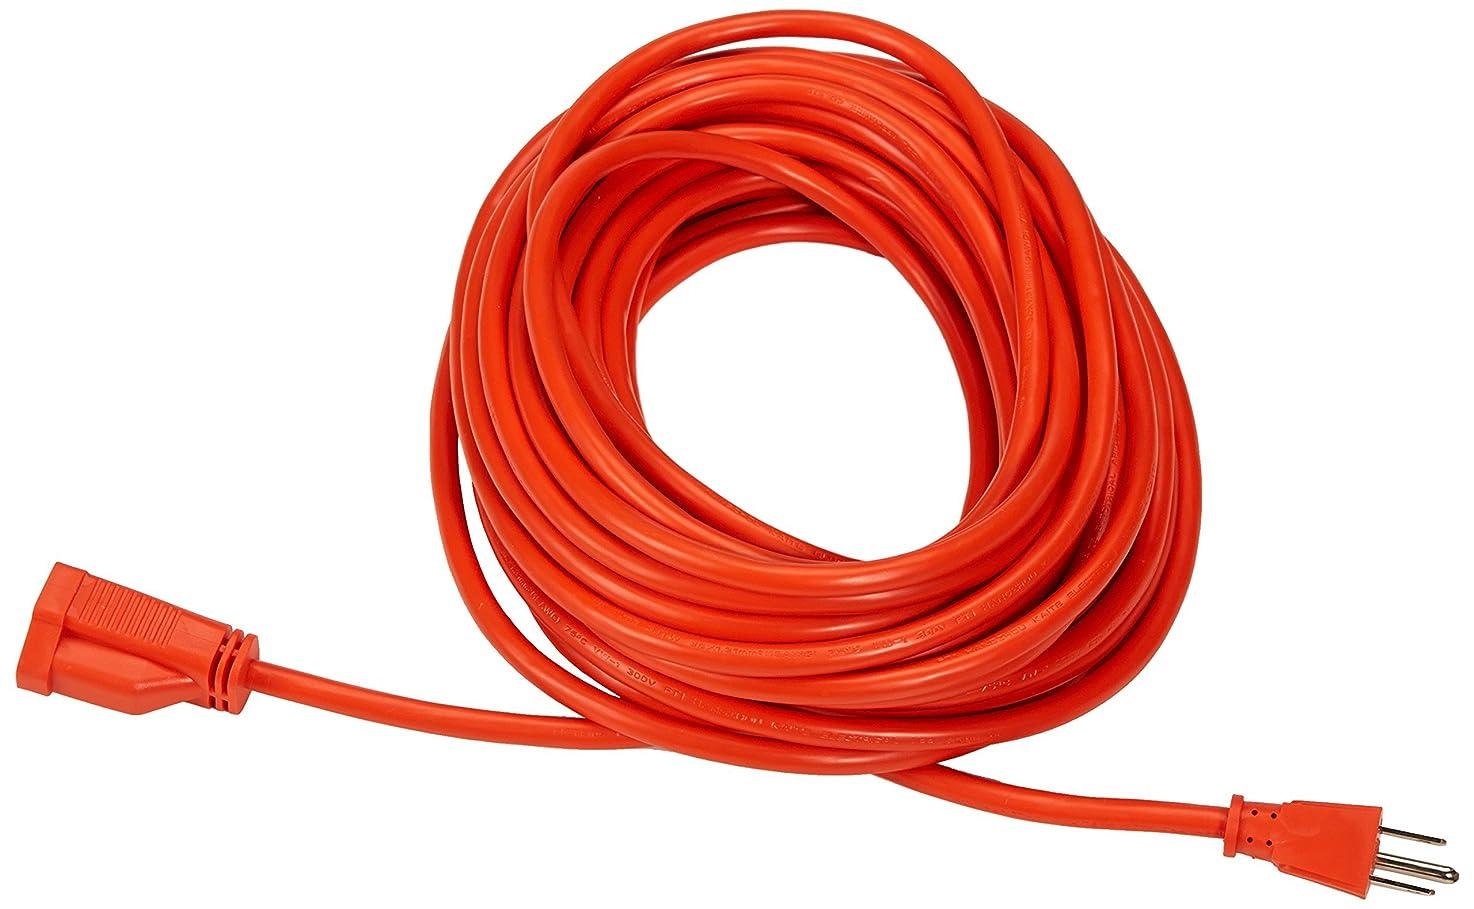 AmazonBasics 16/3 Vinyl Outdoor Extension Cord | Orange, 50-Foot pzwswvbpqedor2